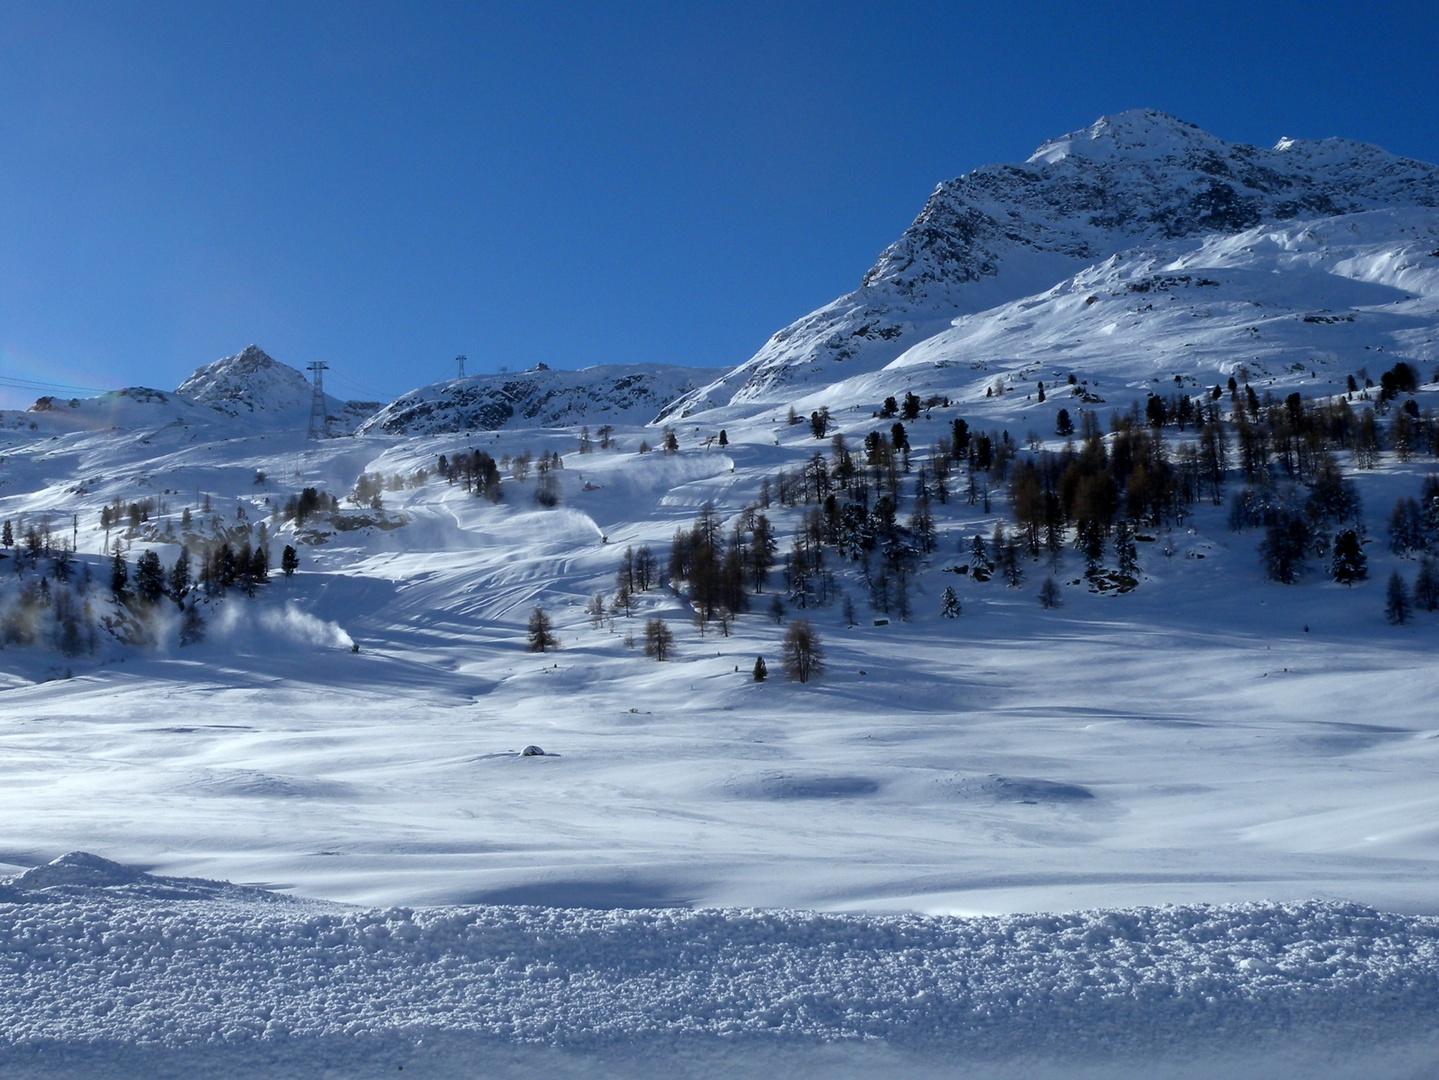 neige et ciel bleu..02